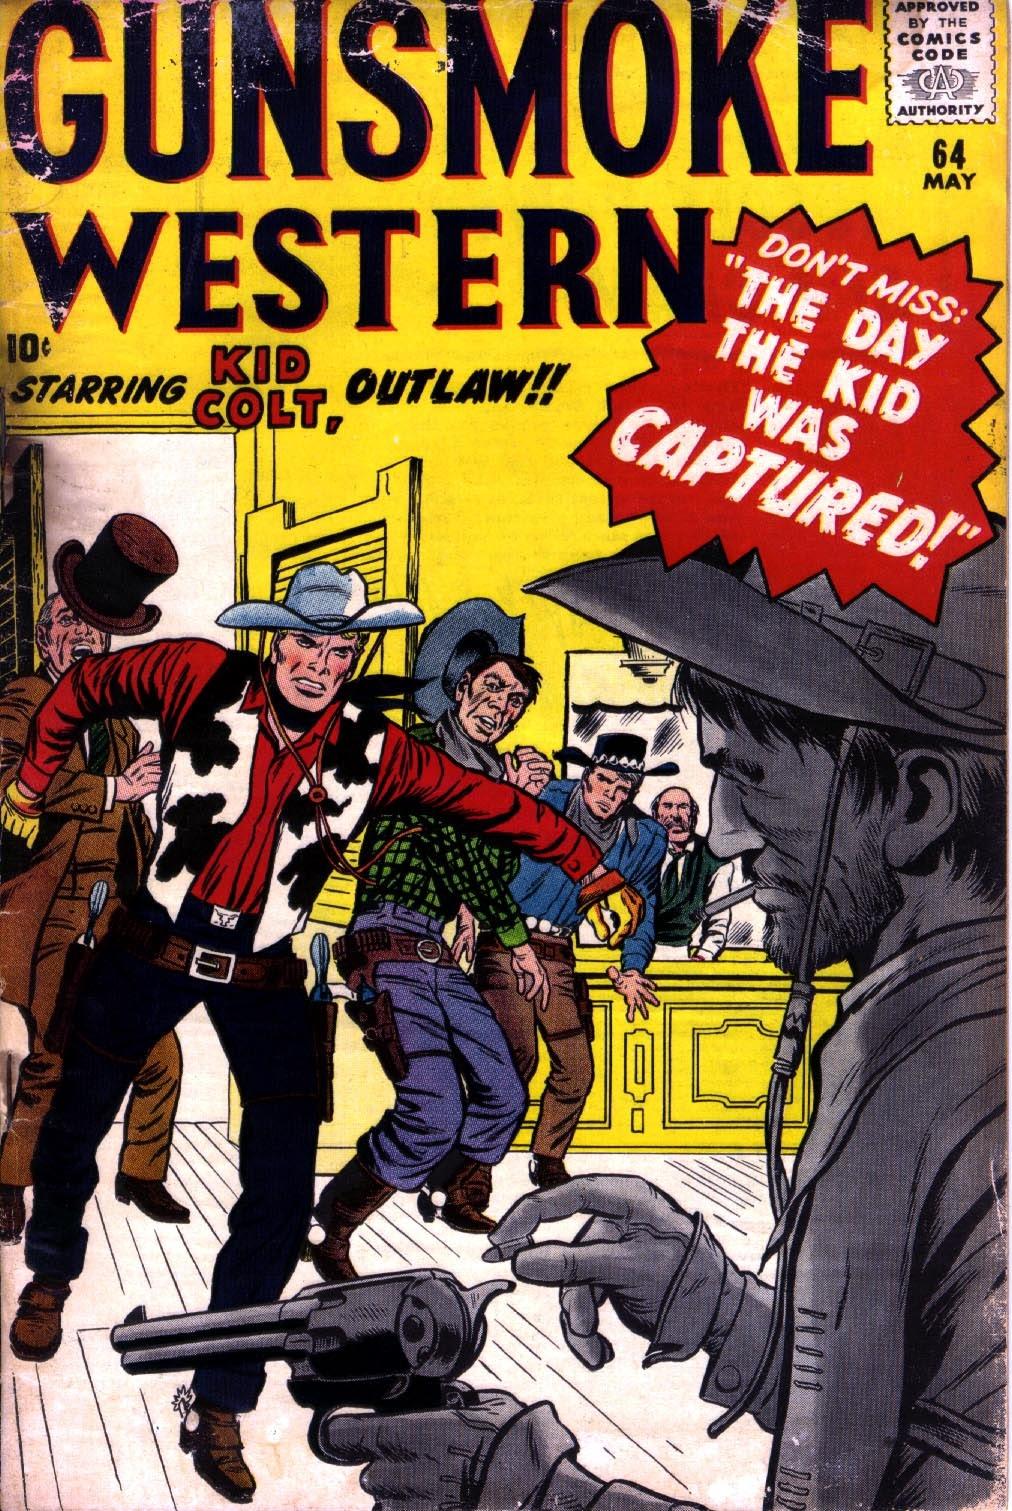 Gunsmoke Western 64 Page 1